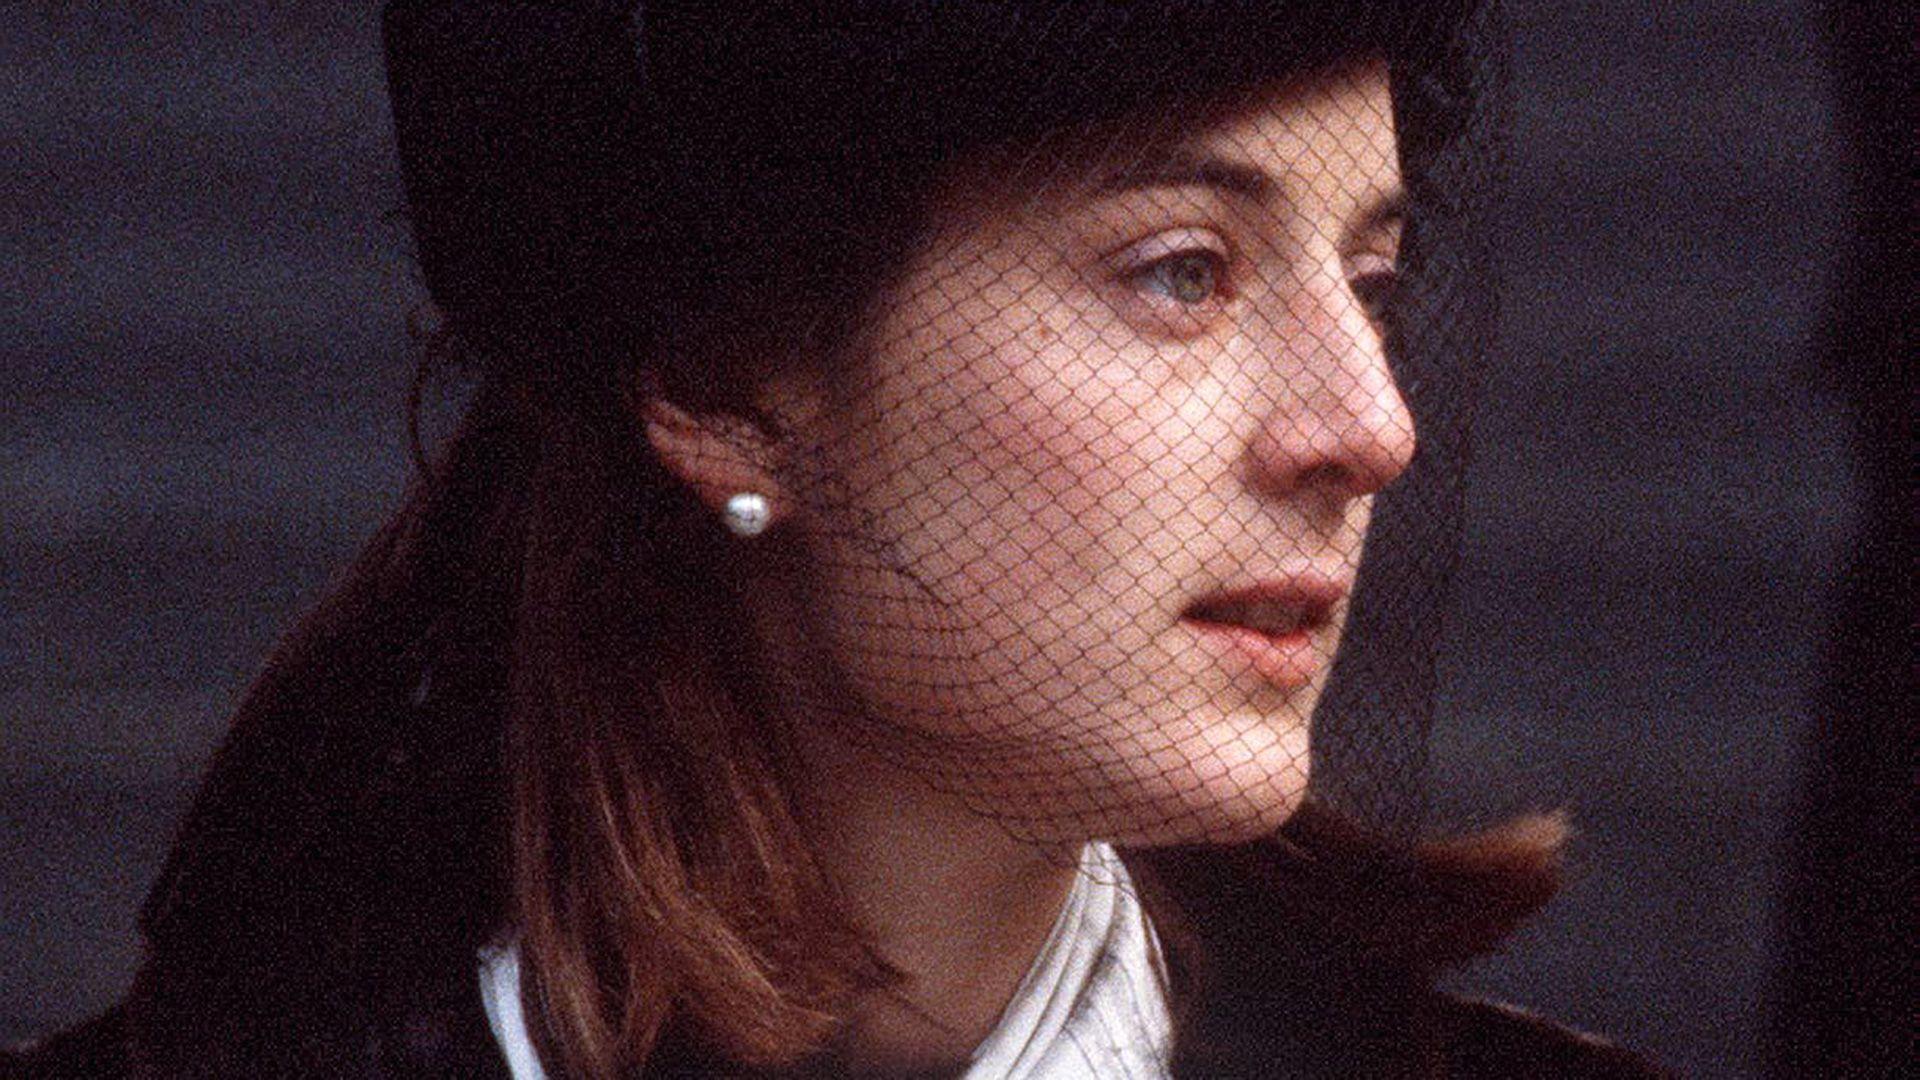 Amanda Knatchbull